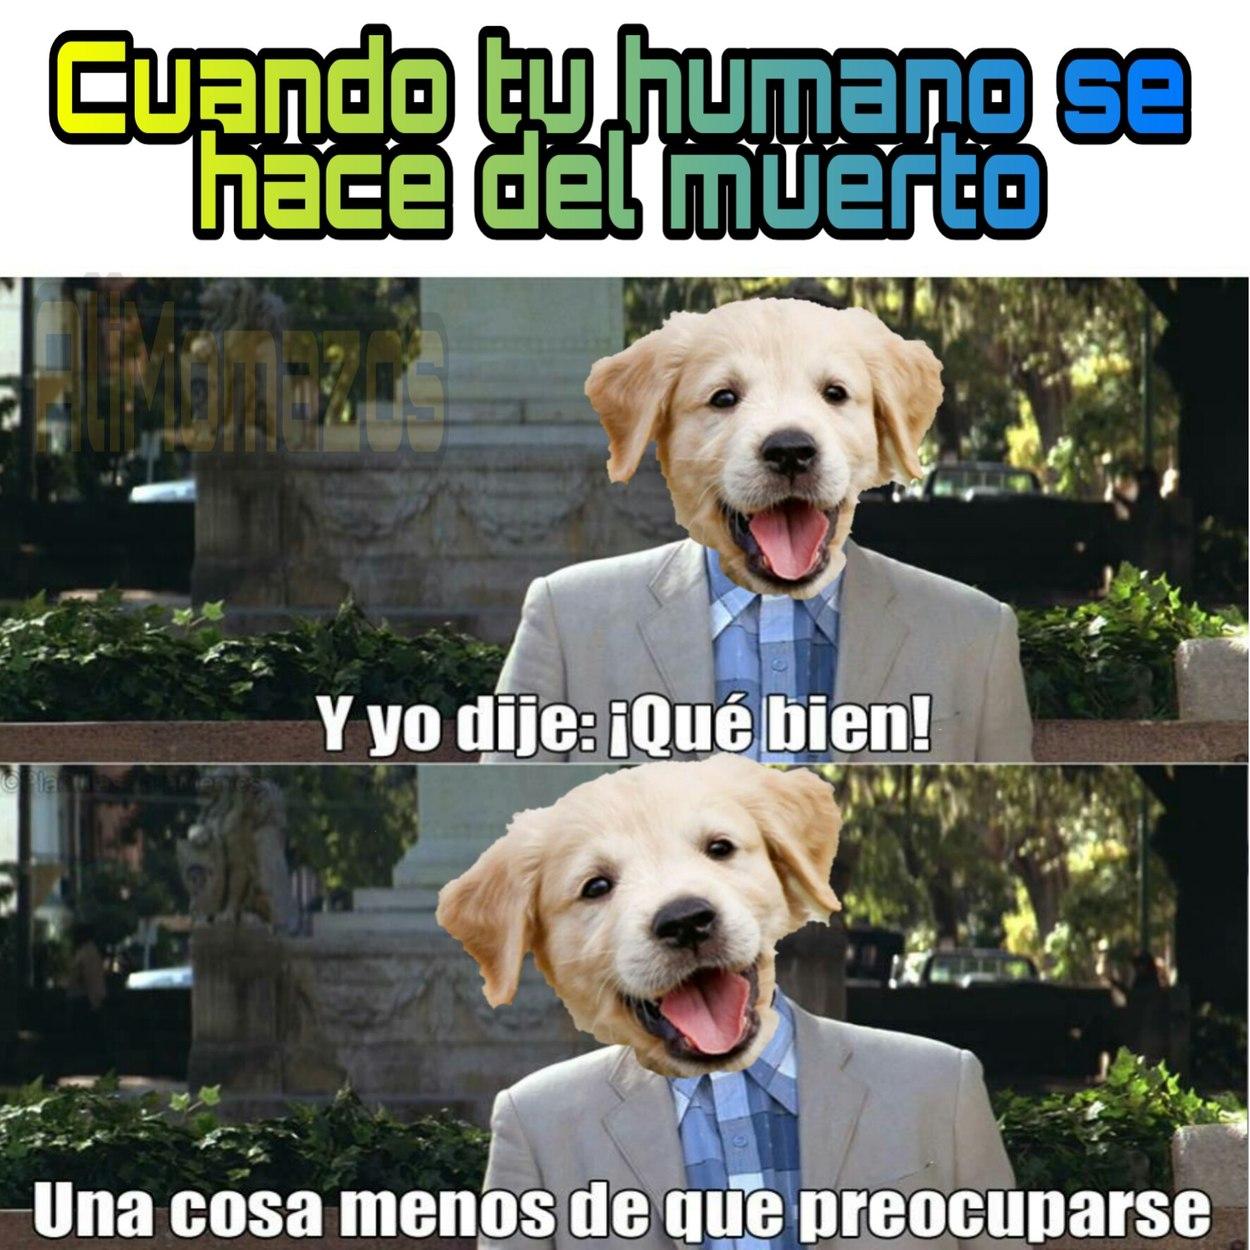 Morite gil - meme